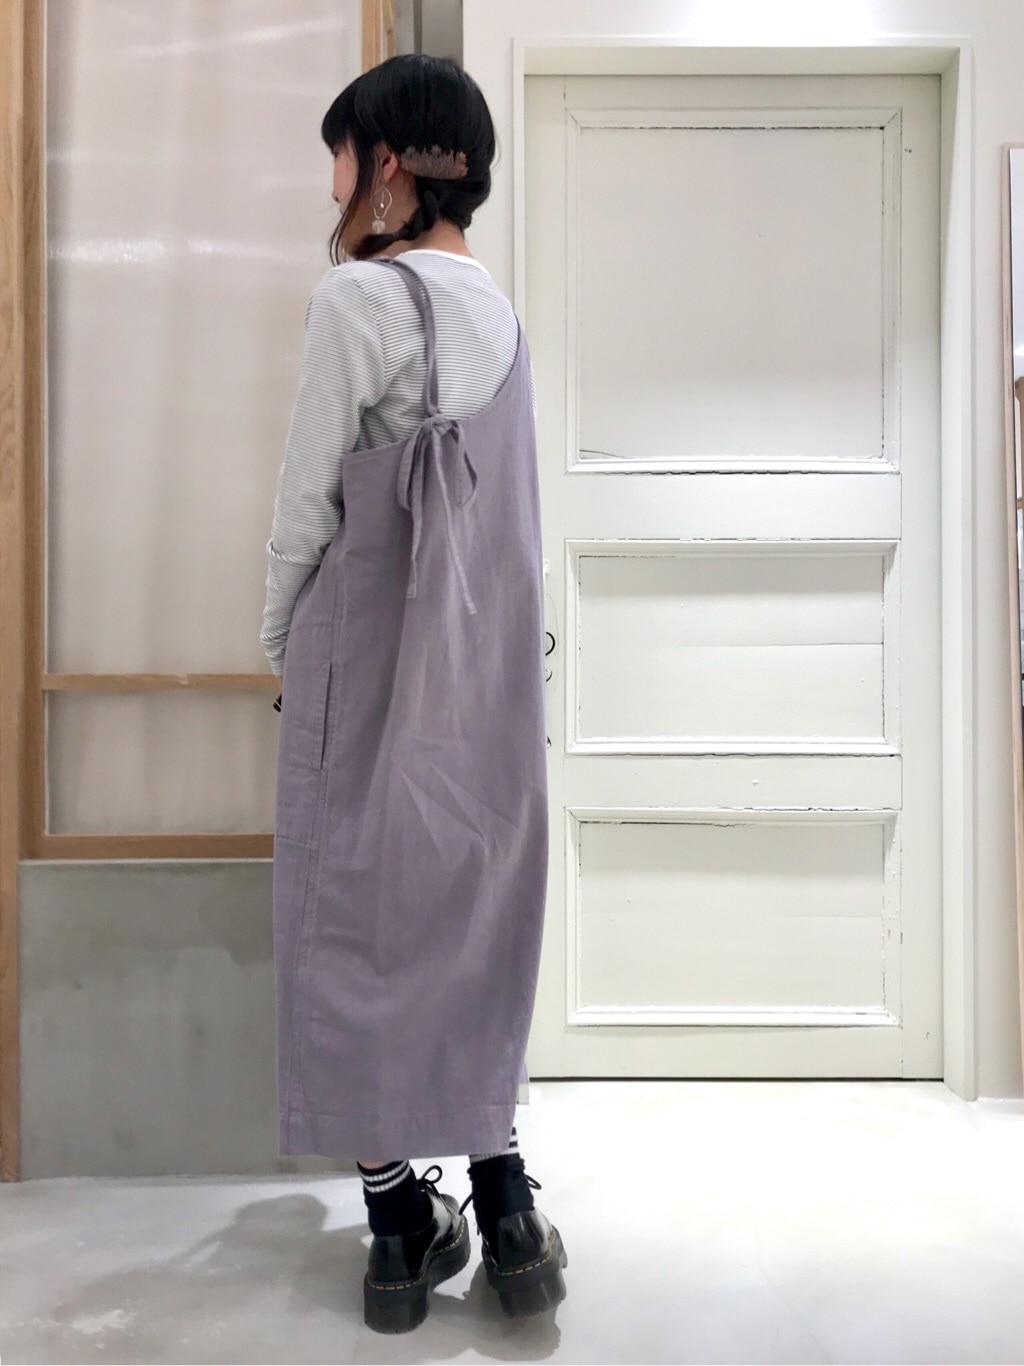 bulle de savon 渋谷スクランブルスクエア 身長:153cm 2020.03.25